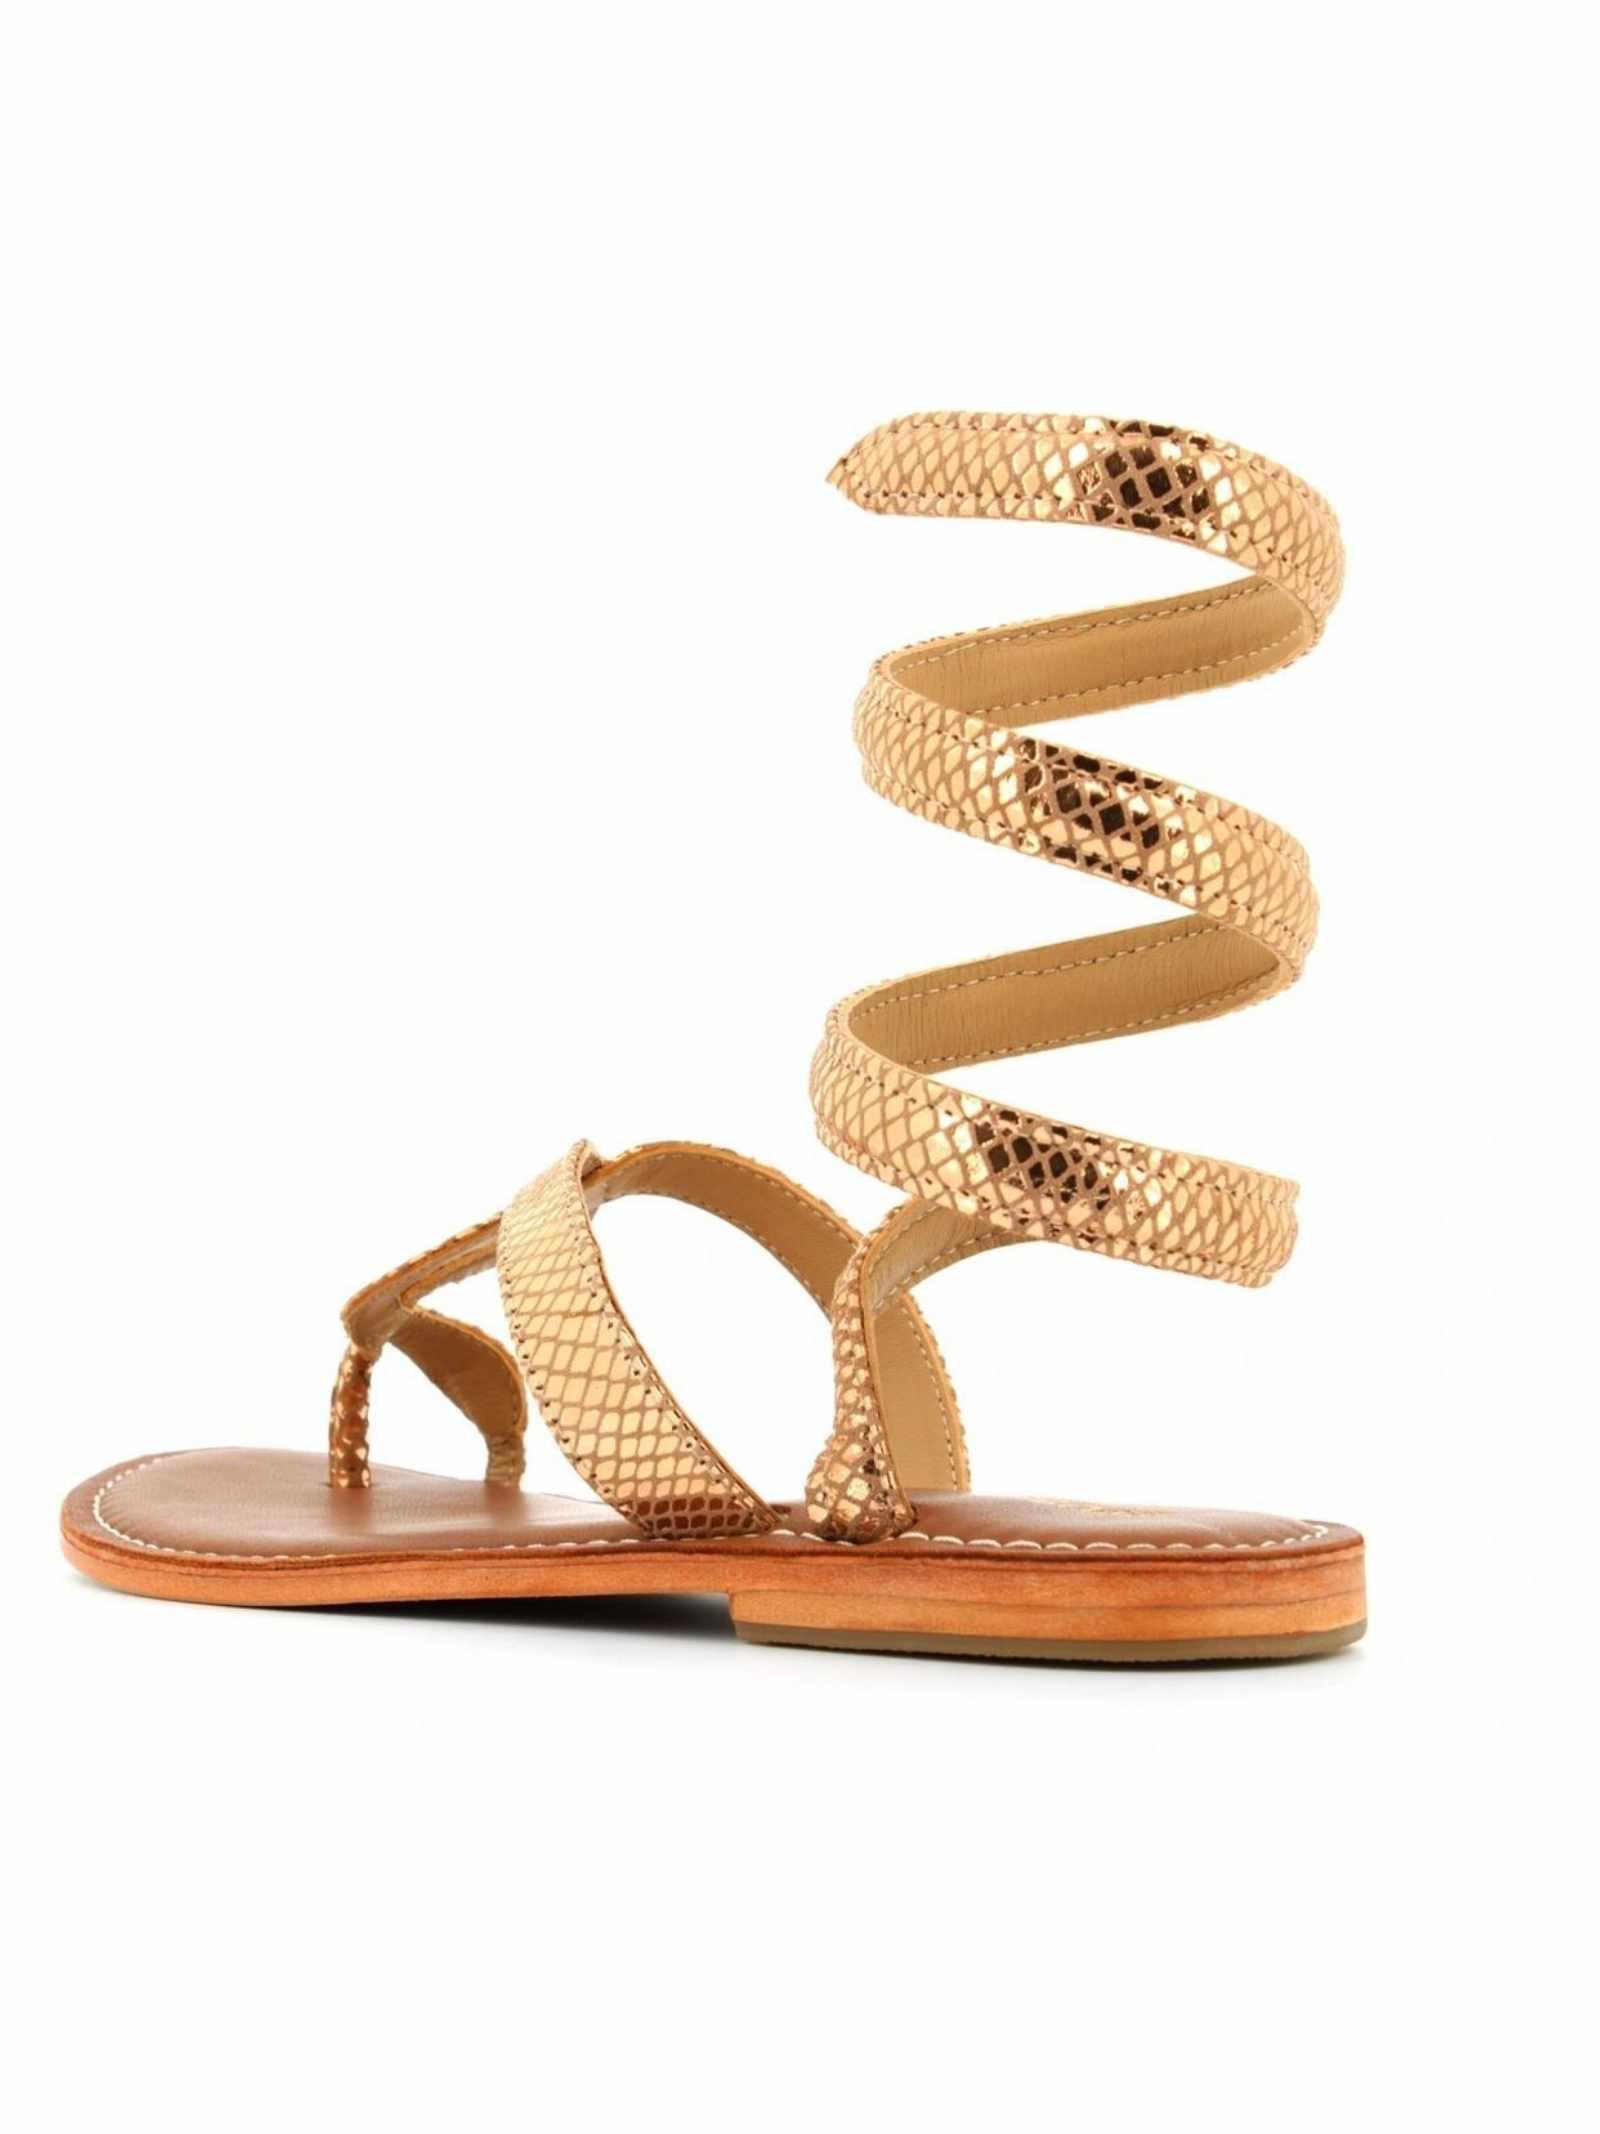 Sandalo laminato in oro FUSION | Sandalo | CBF.R217037PKG